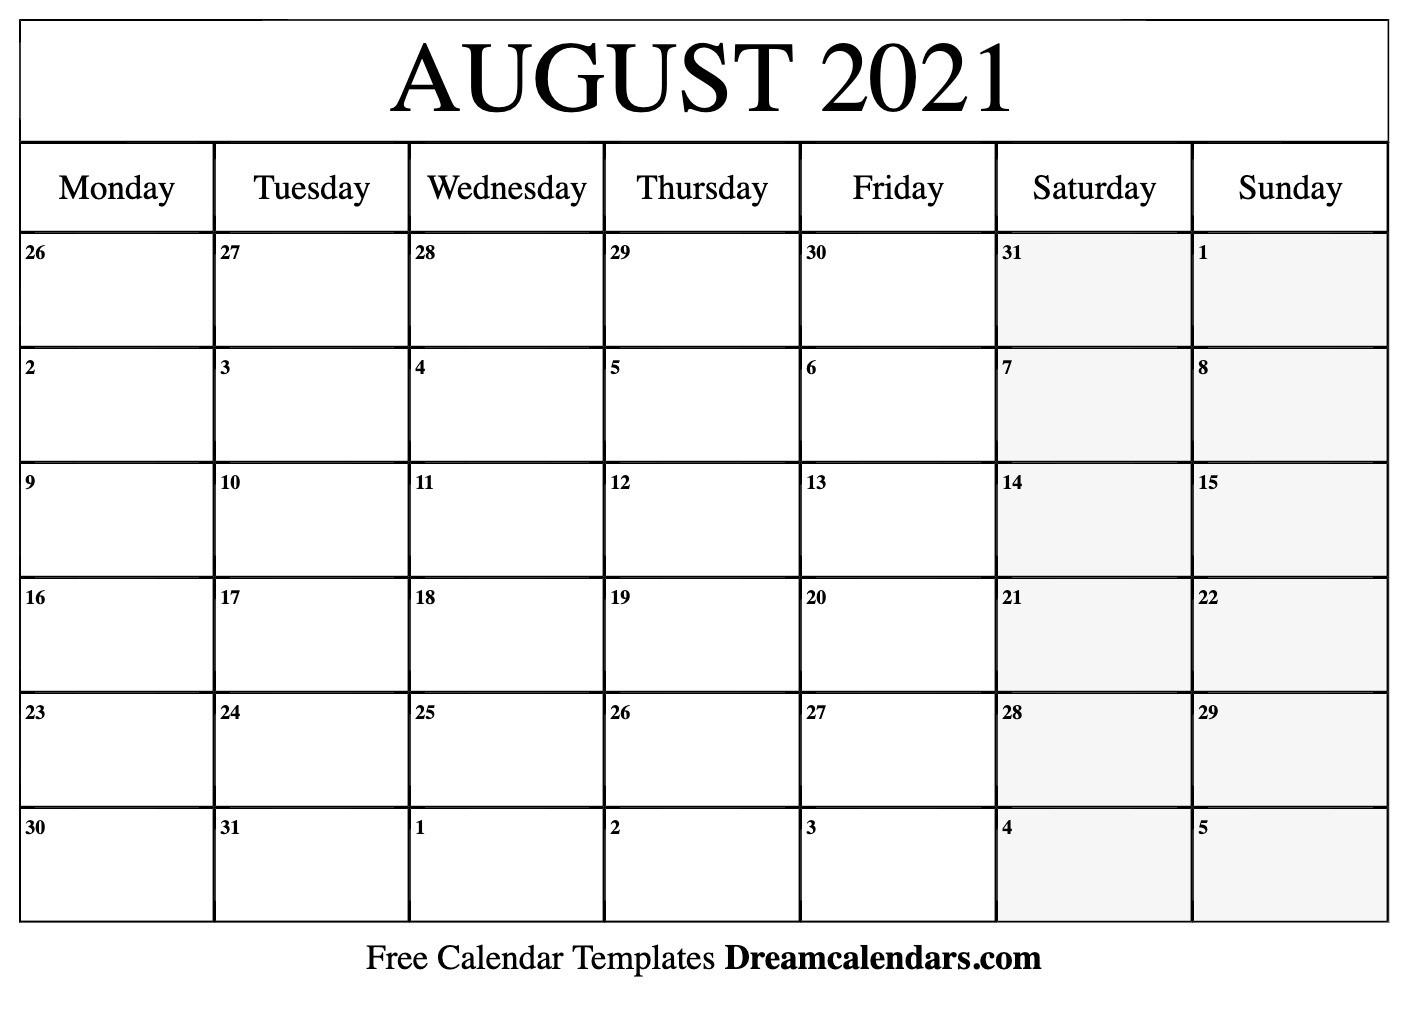 August 2021 Calendar | Free Blank Printable Templates-Free Blank No Date Printable Calendar 2021